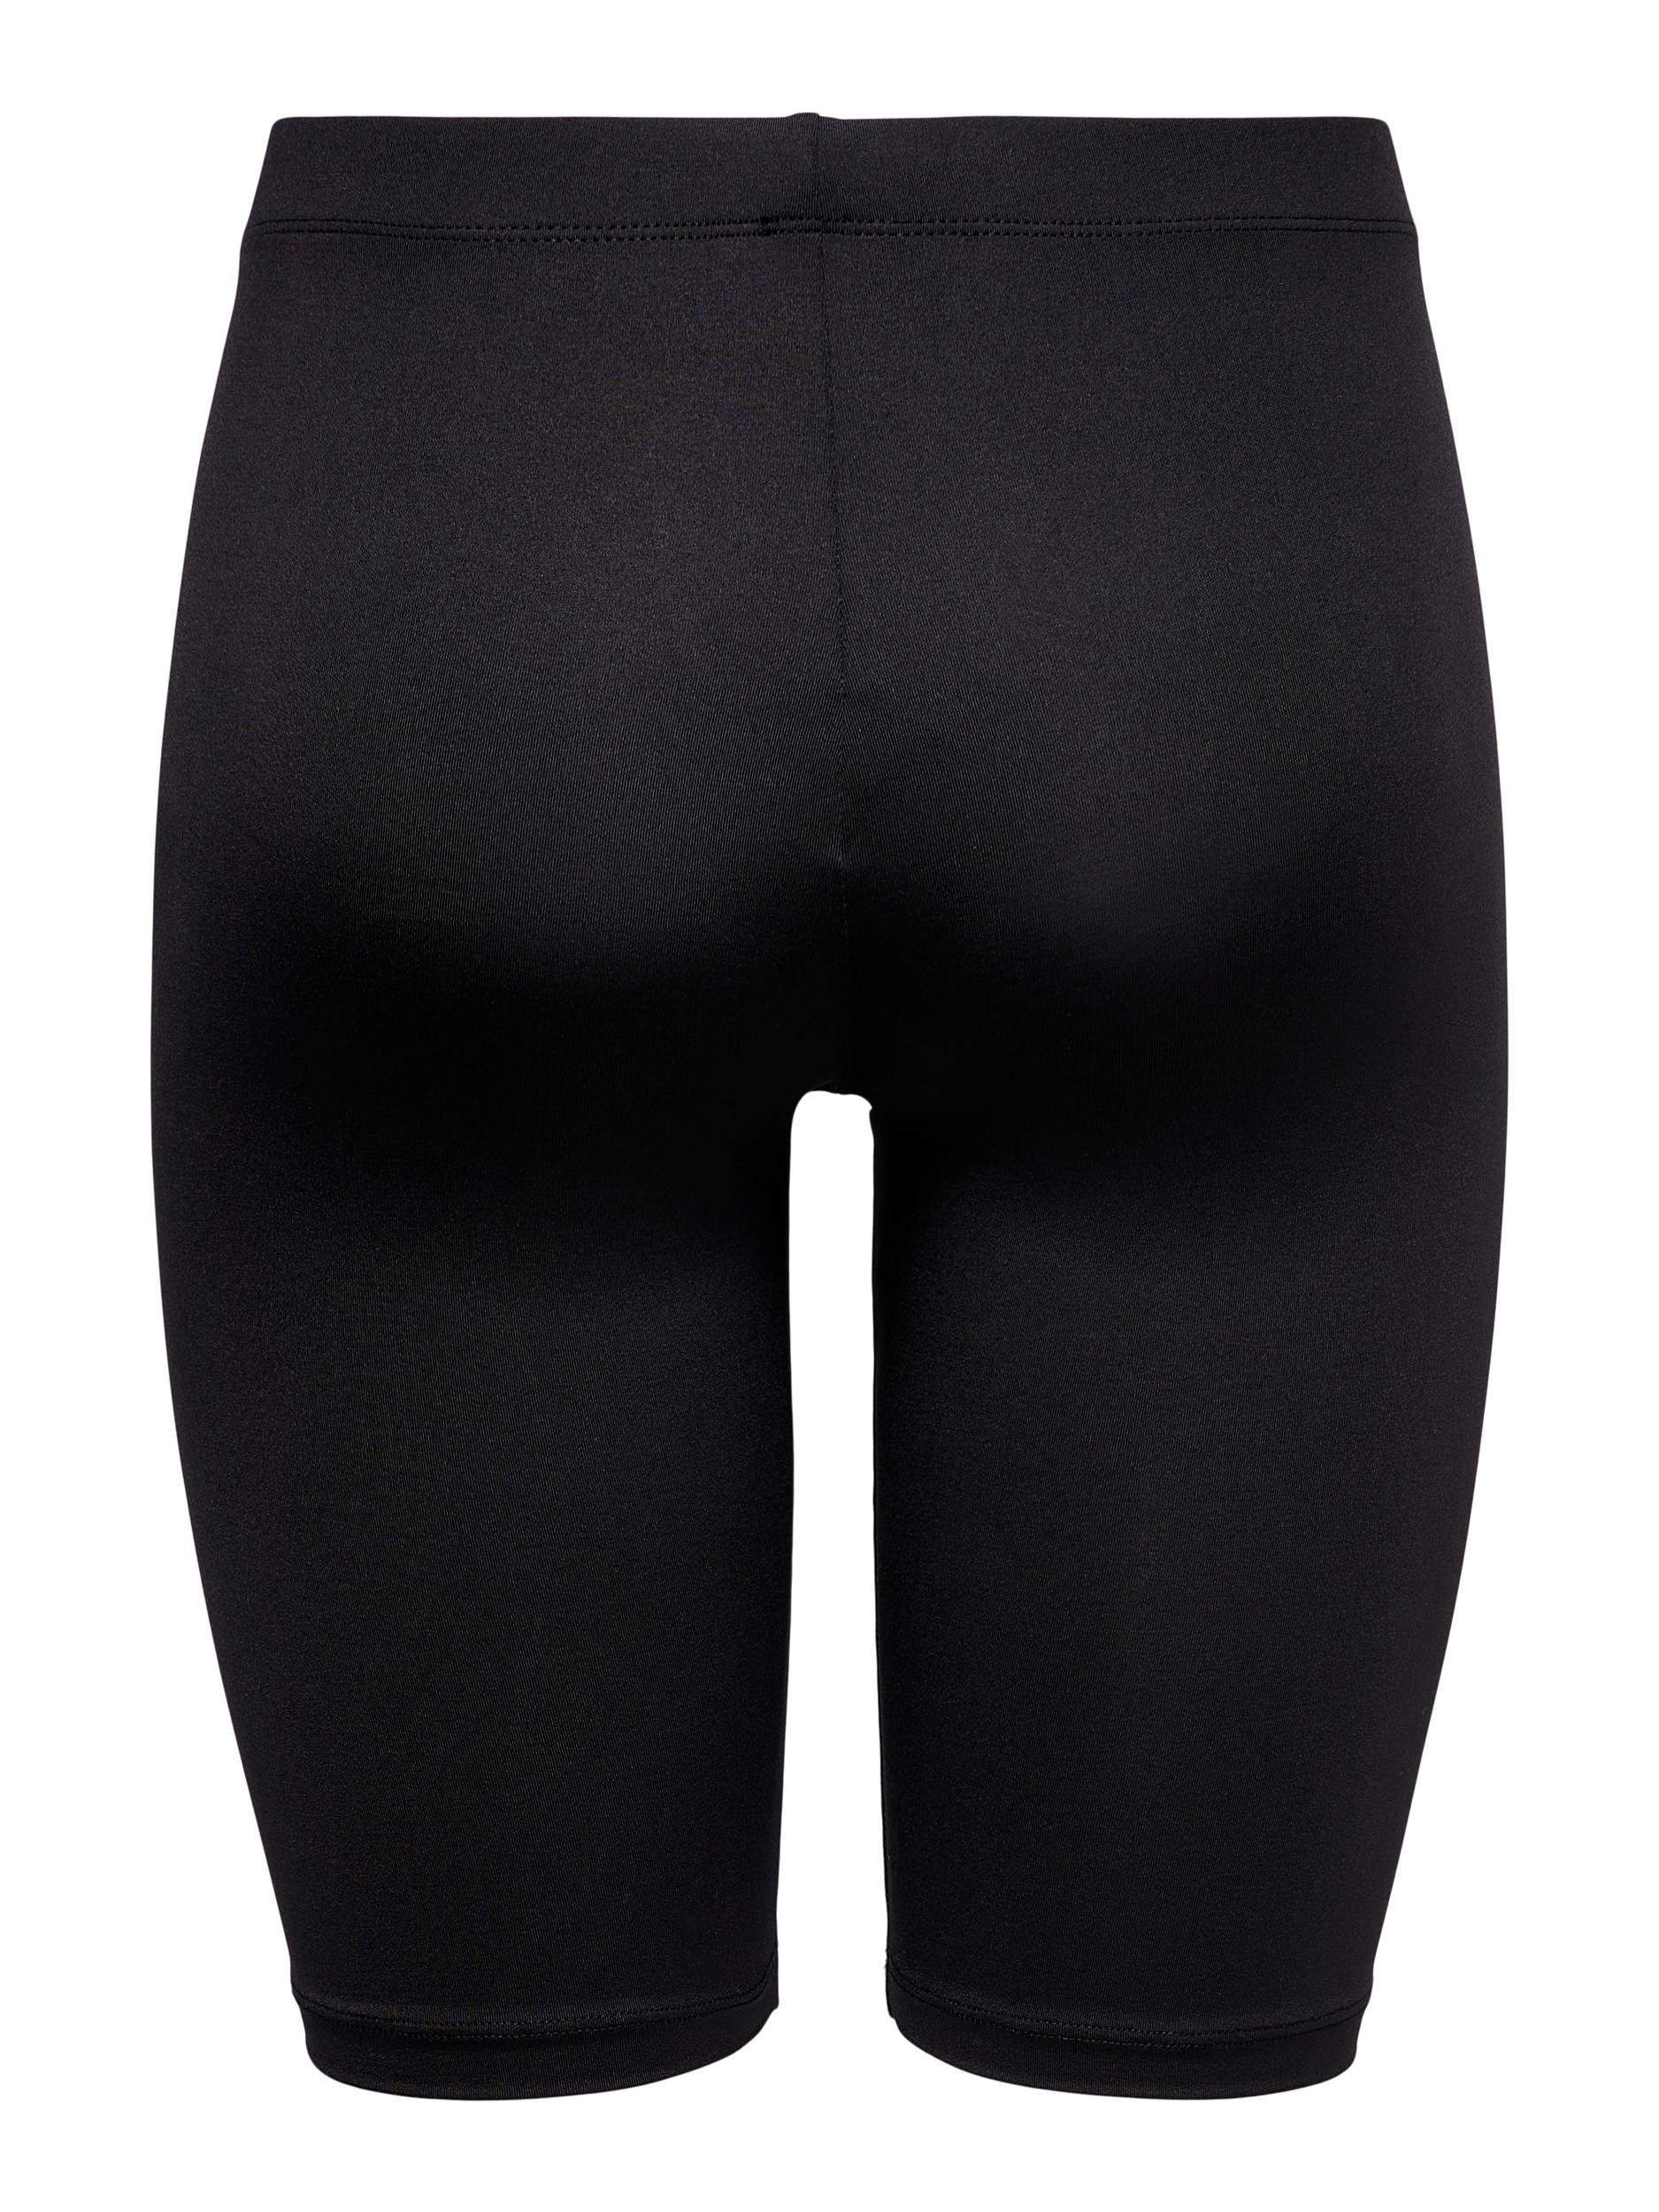 Jacqueline de Yong Rossy biker shorts, black, x-small